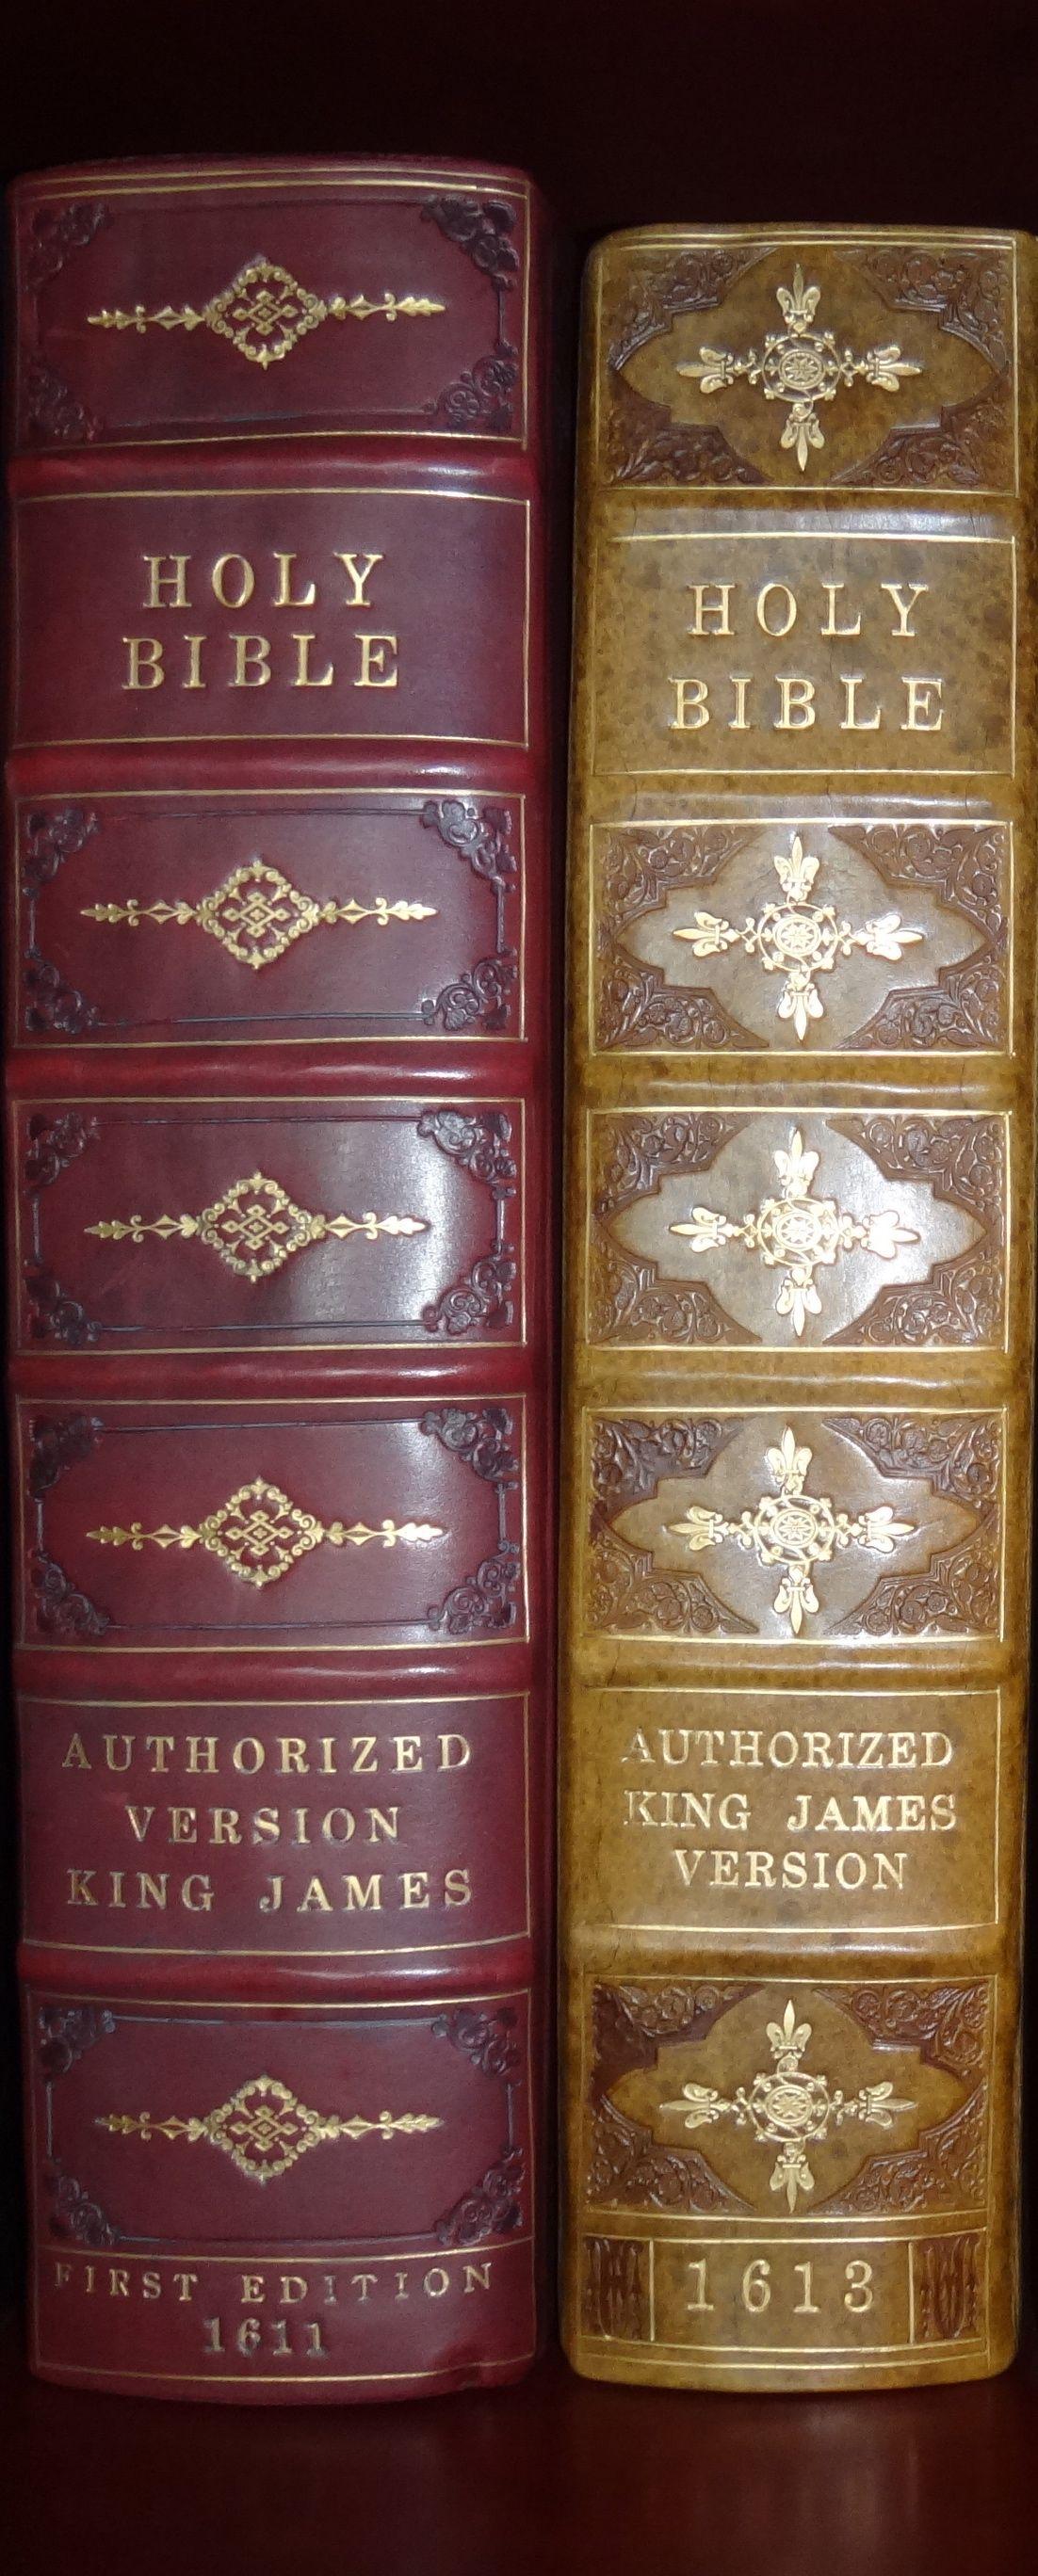 1611 King James Bible First Edition & 1613 King James Bible